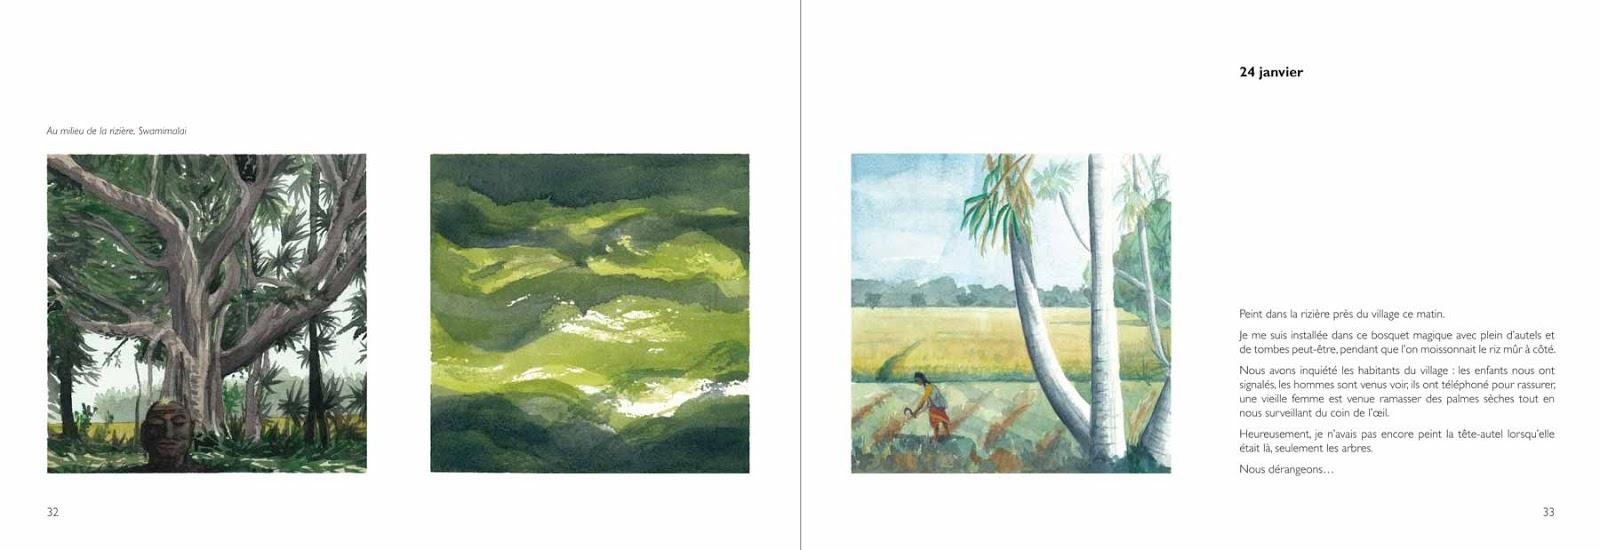 Carnet de voyage en Inde - Annik Reymond Michel Lizot 32-33